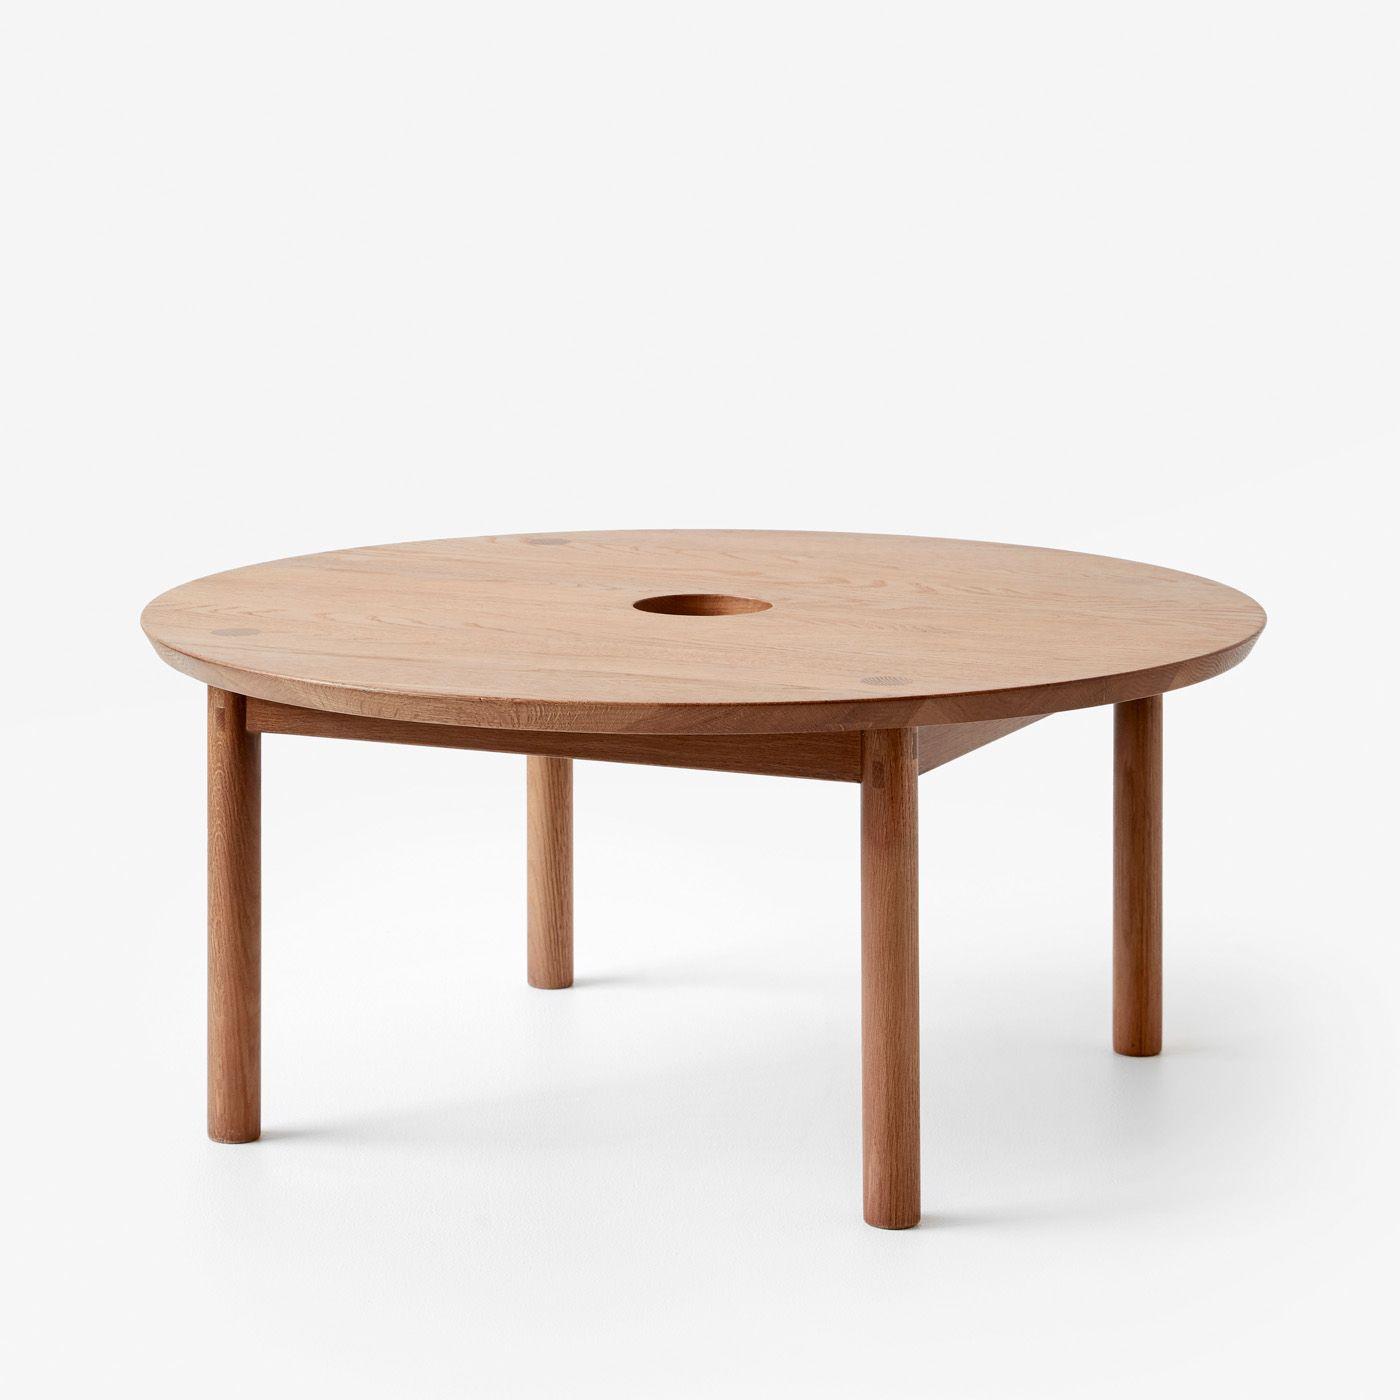 Aurea Sienna Coffee Table In 2021 Coffee Table White Oak Coffee Table Oak Coffee Table [ 1400 x 1400 Pixel ]